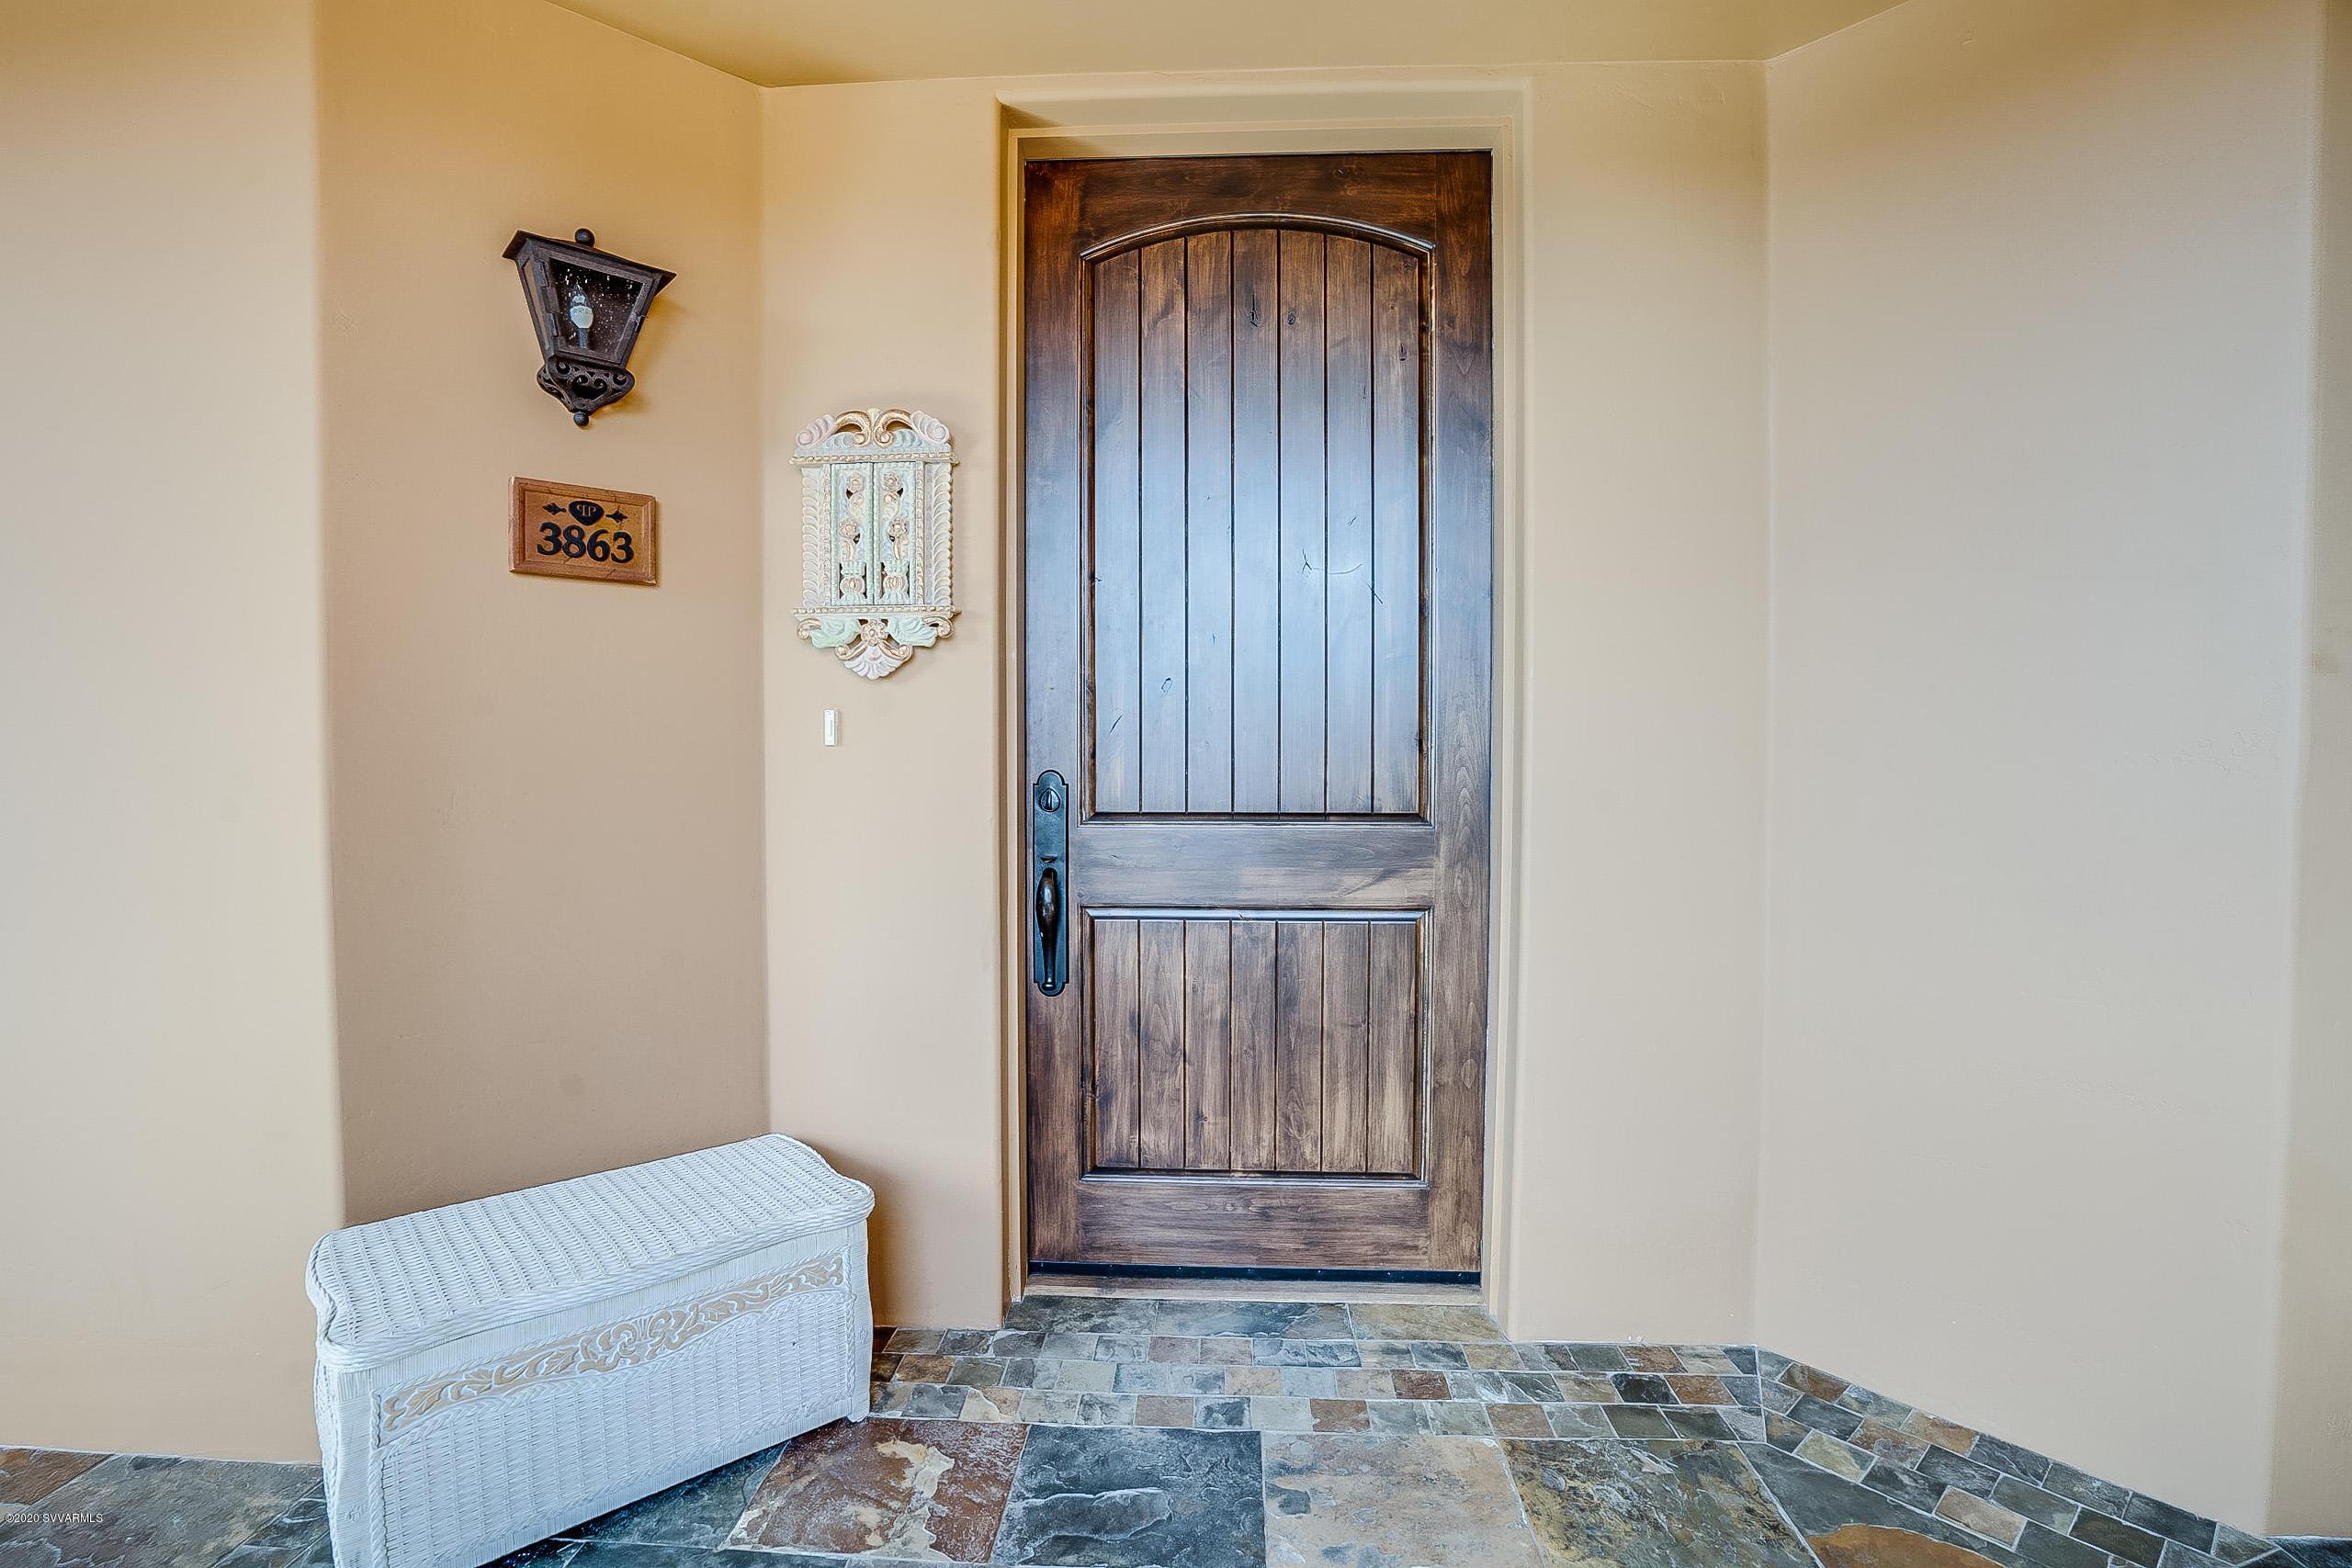 3863 Portofino Way UNIT 11 Sedona, AZ 86336